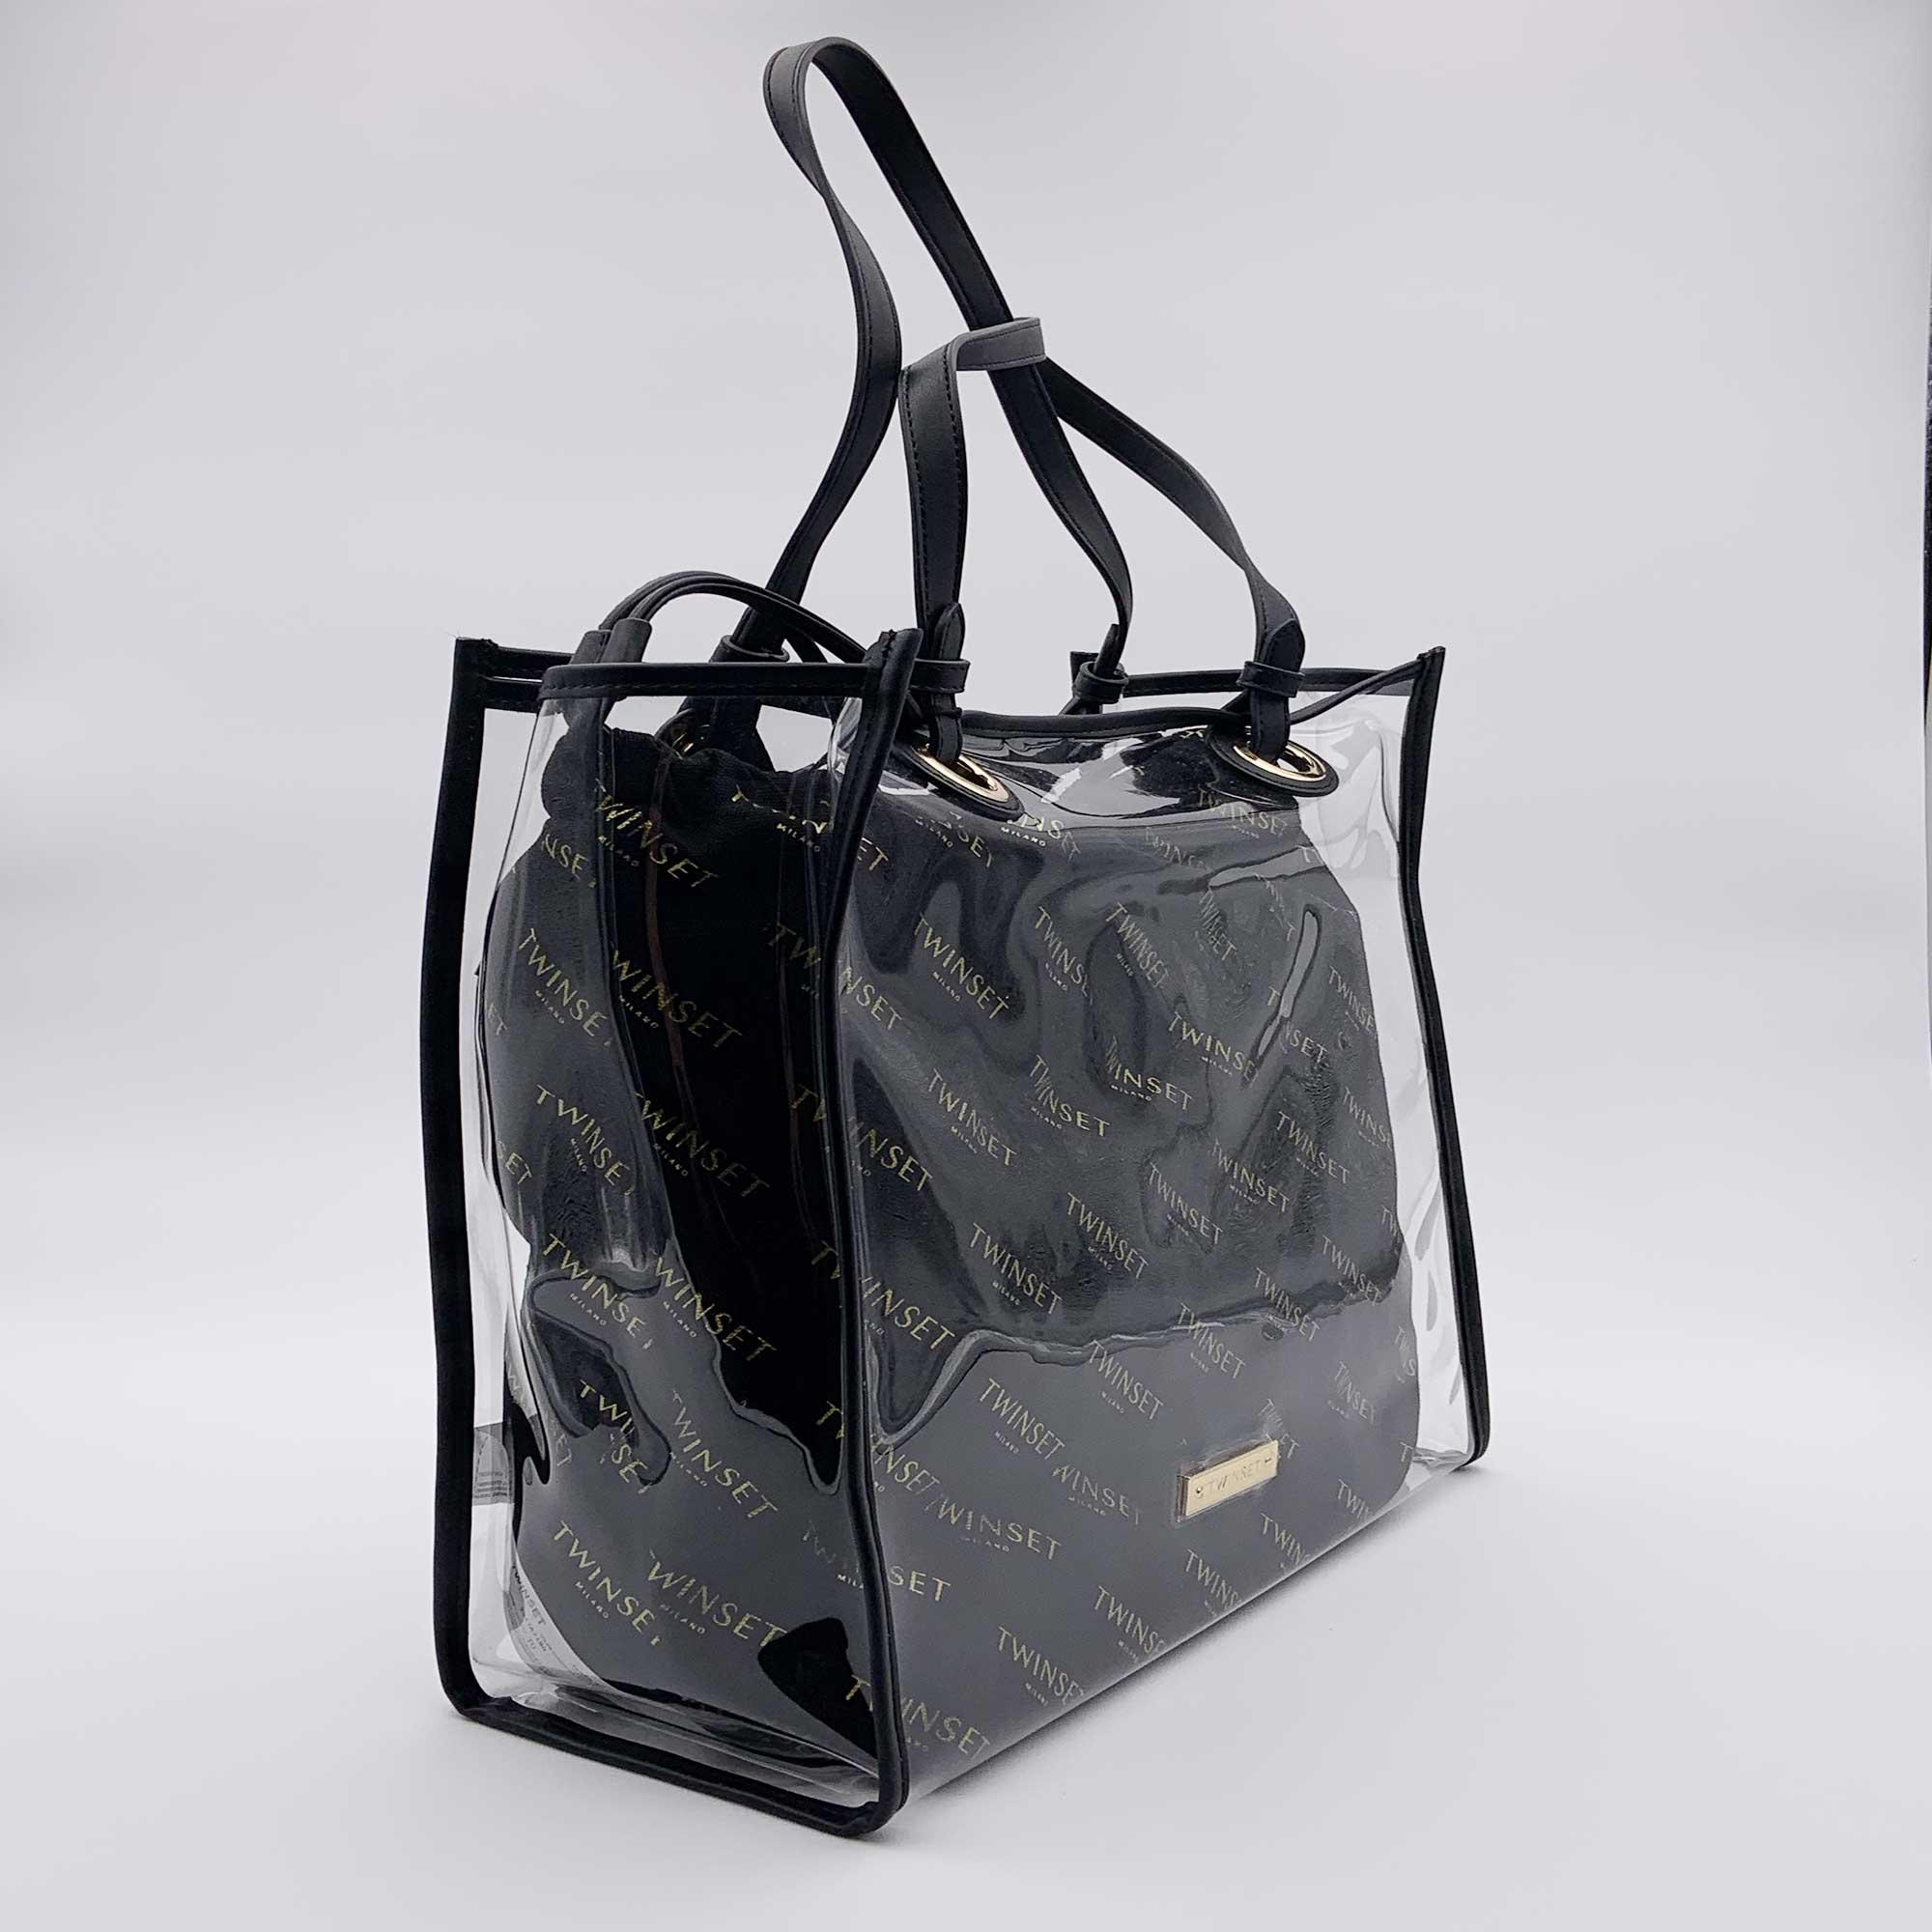 Borsa shopper con sacca logata - Nero